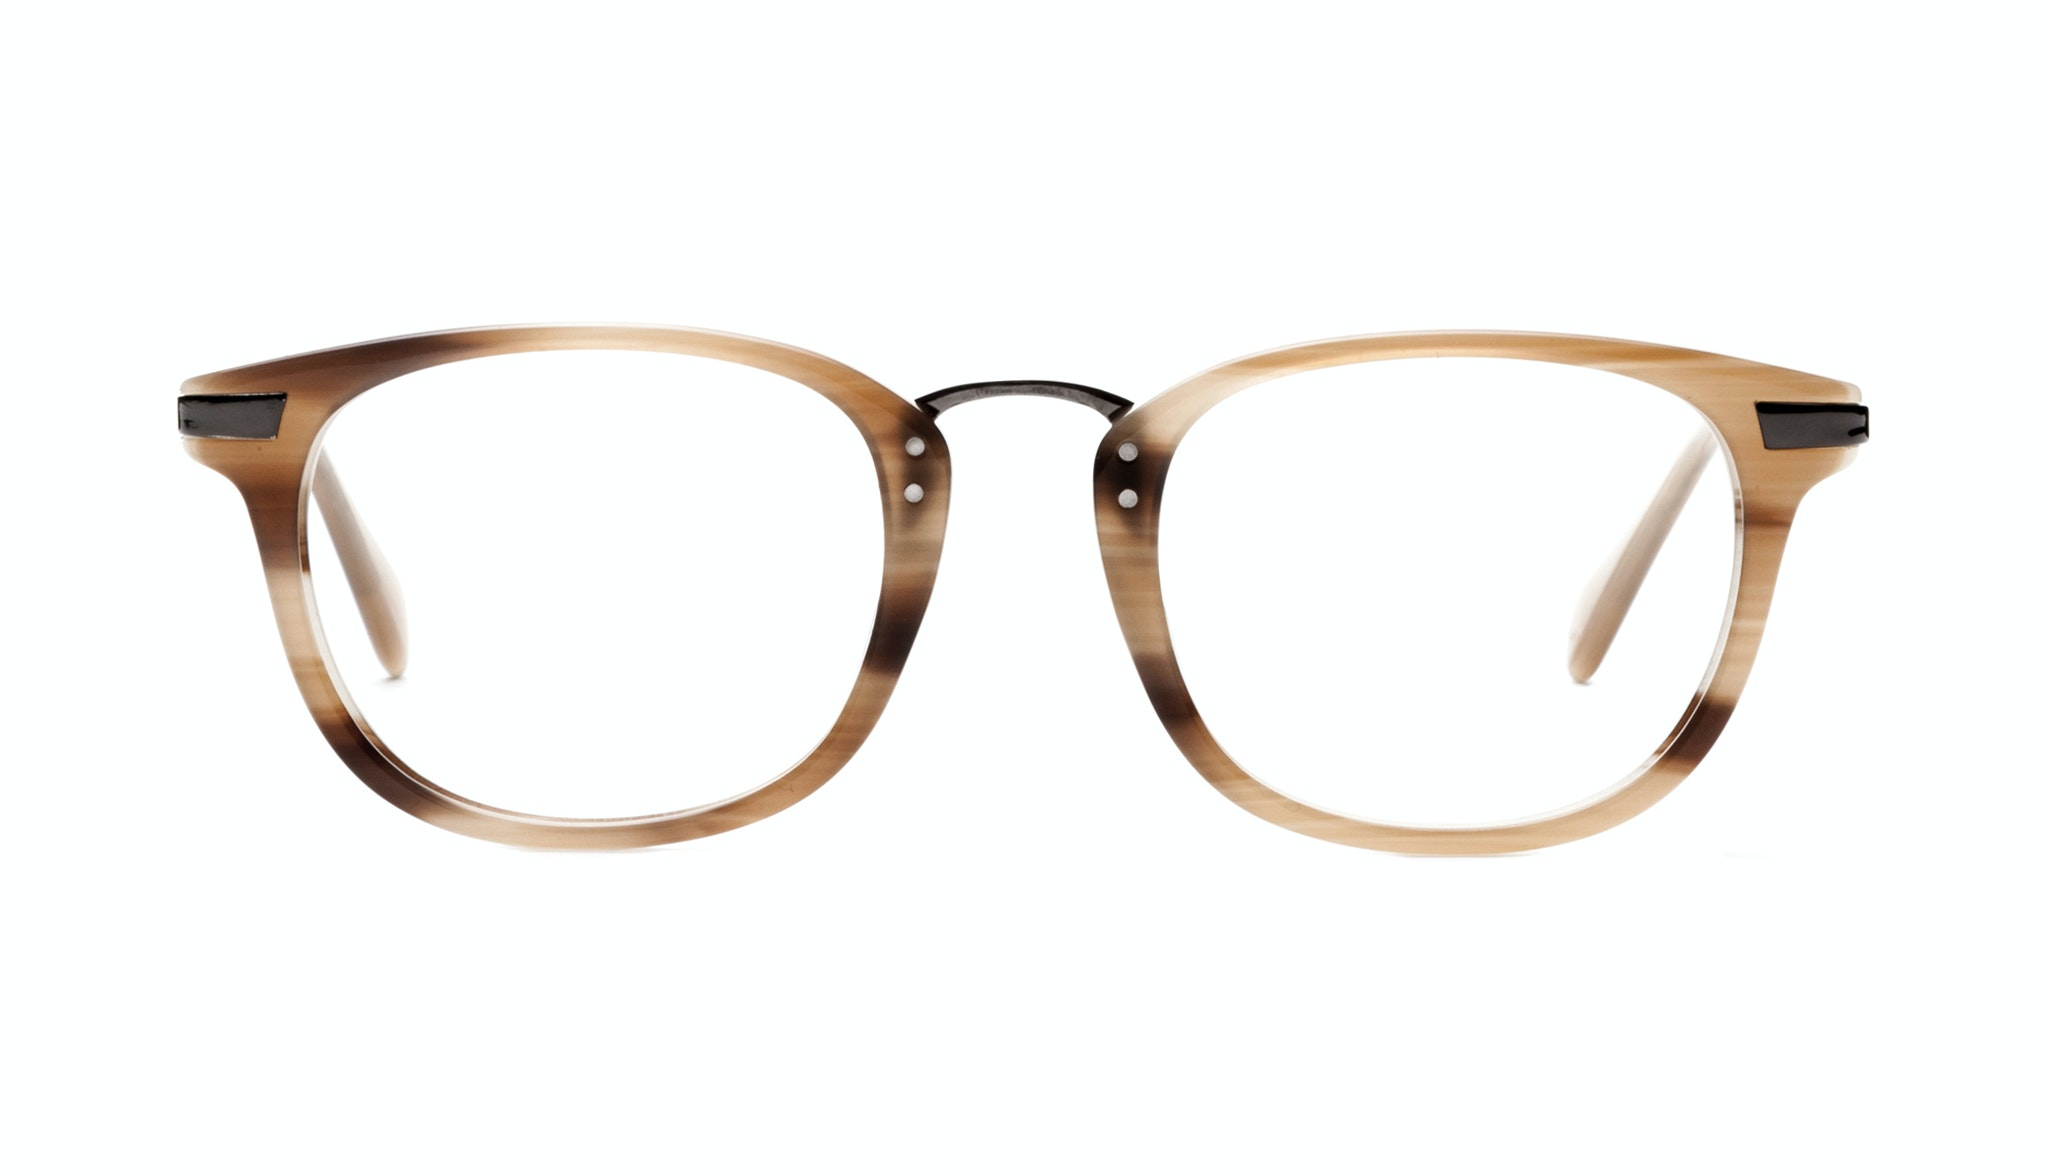 Affordable Fashion Glasses Rectangle Eyeglasses Men Women Daze Toffee